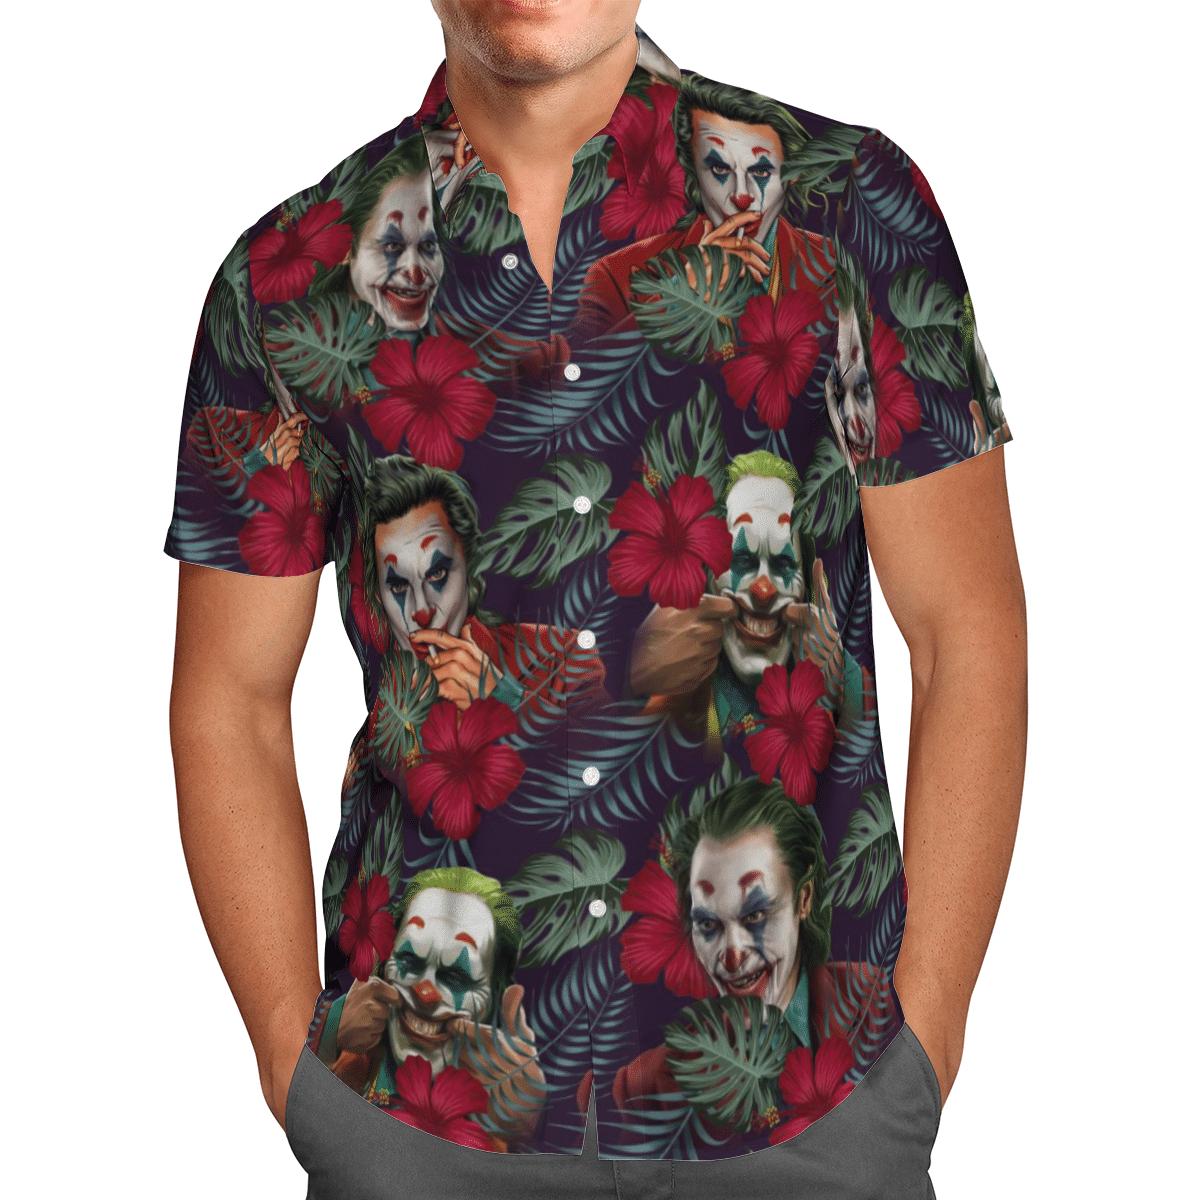 Joker Hawaiian shirt and short